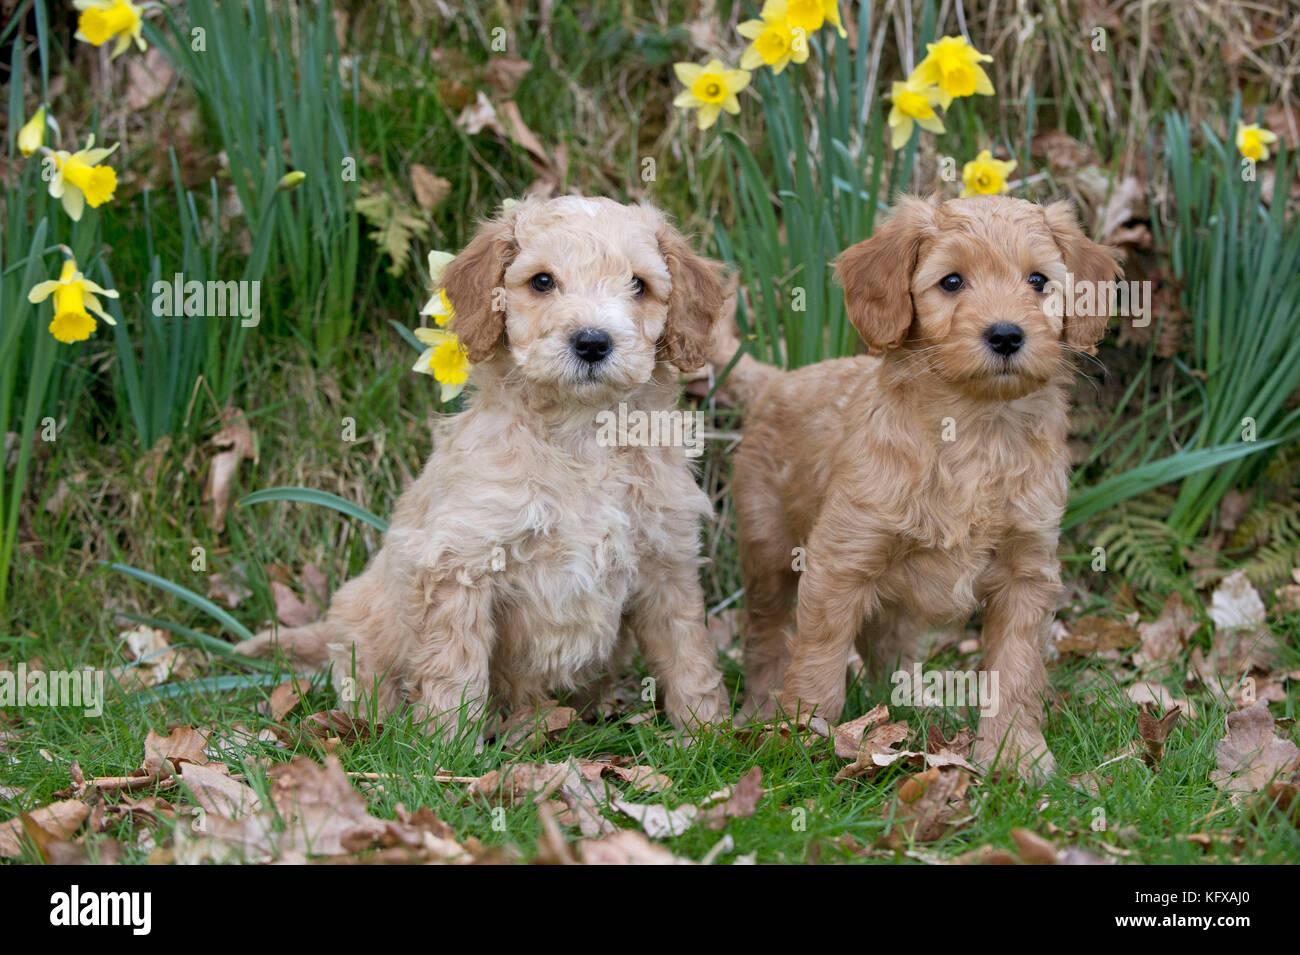 Dog - Cockerpoo 7 week old puppies - Stock Image